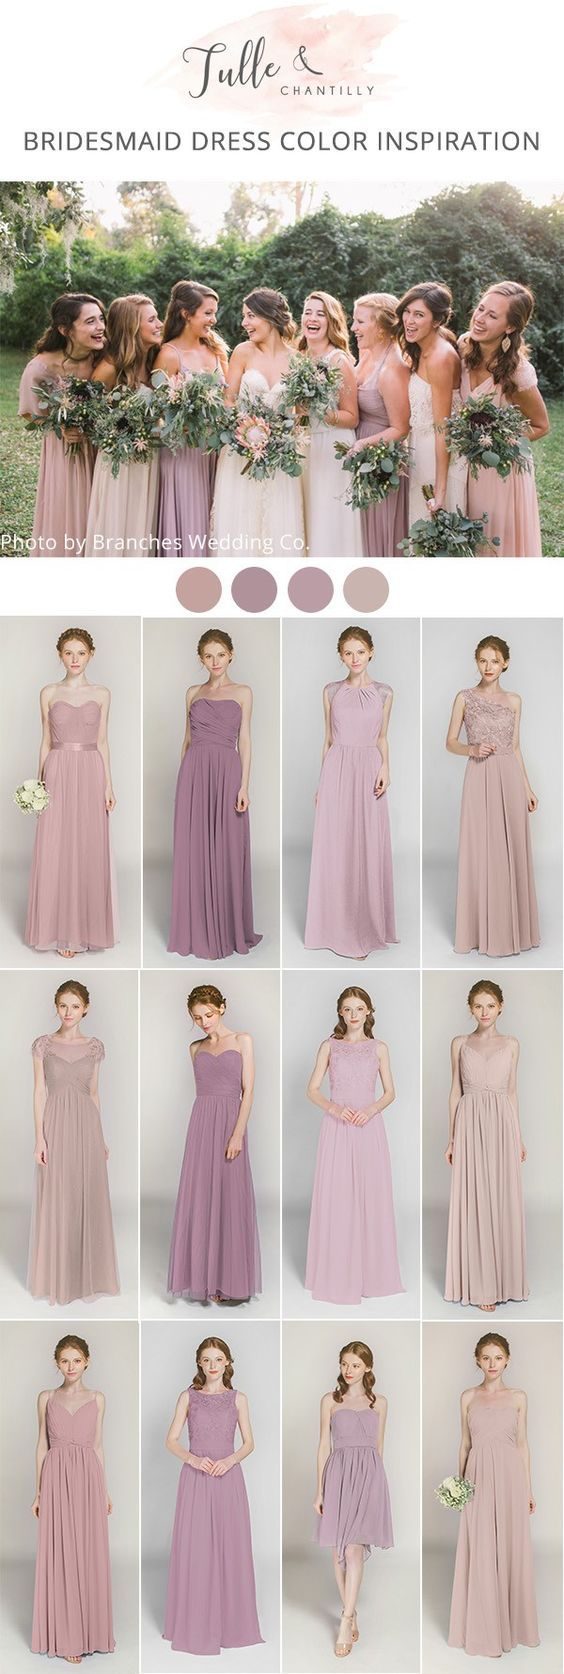 bridesmaid dress,long chiffon dress,long homecoming dress,elegant women dress,2017 new arrival